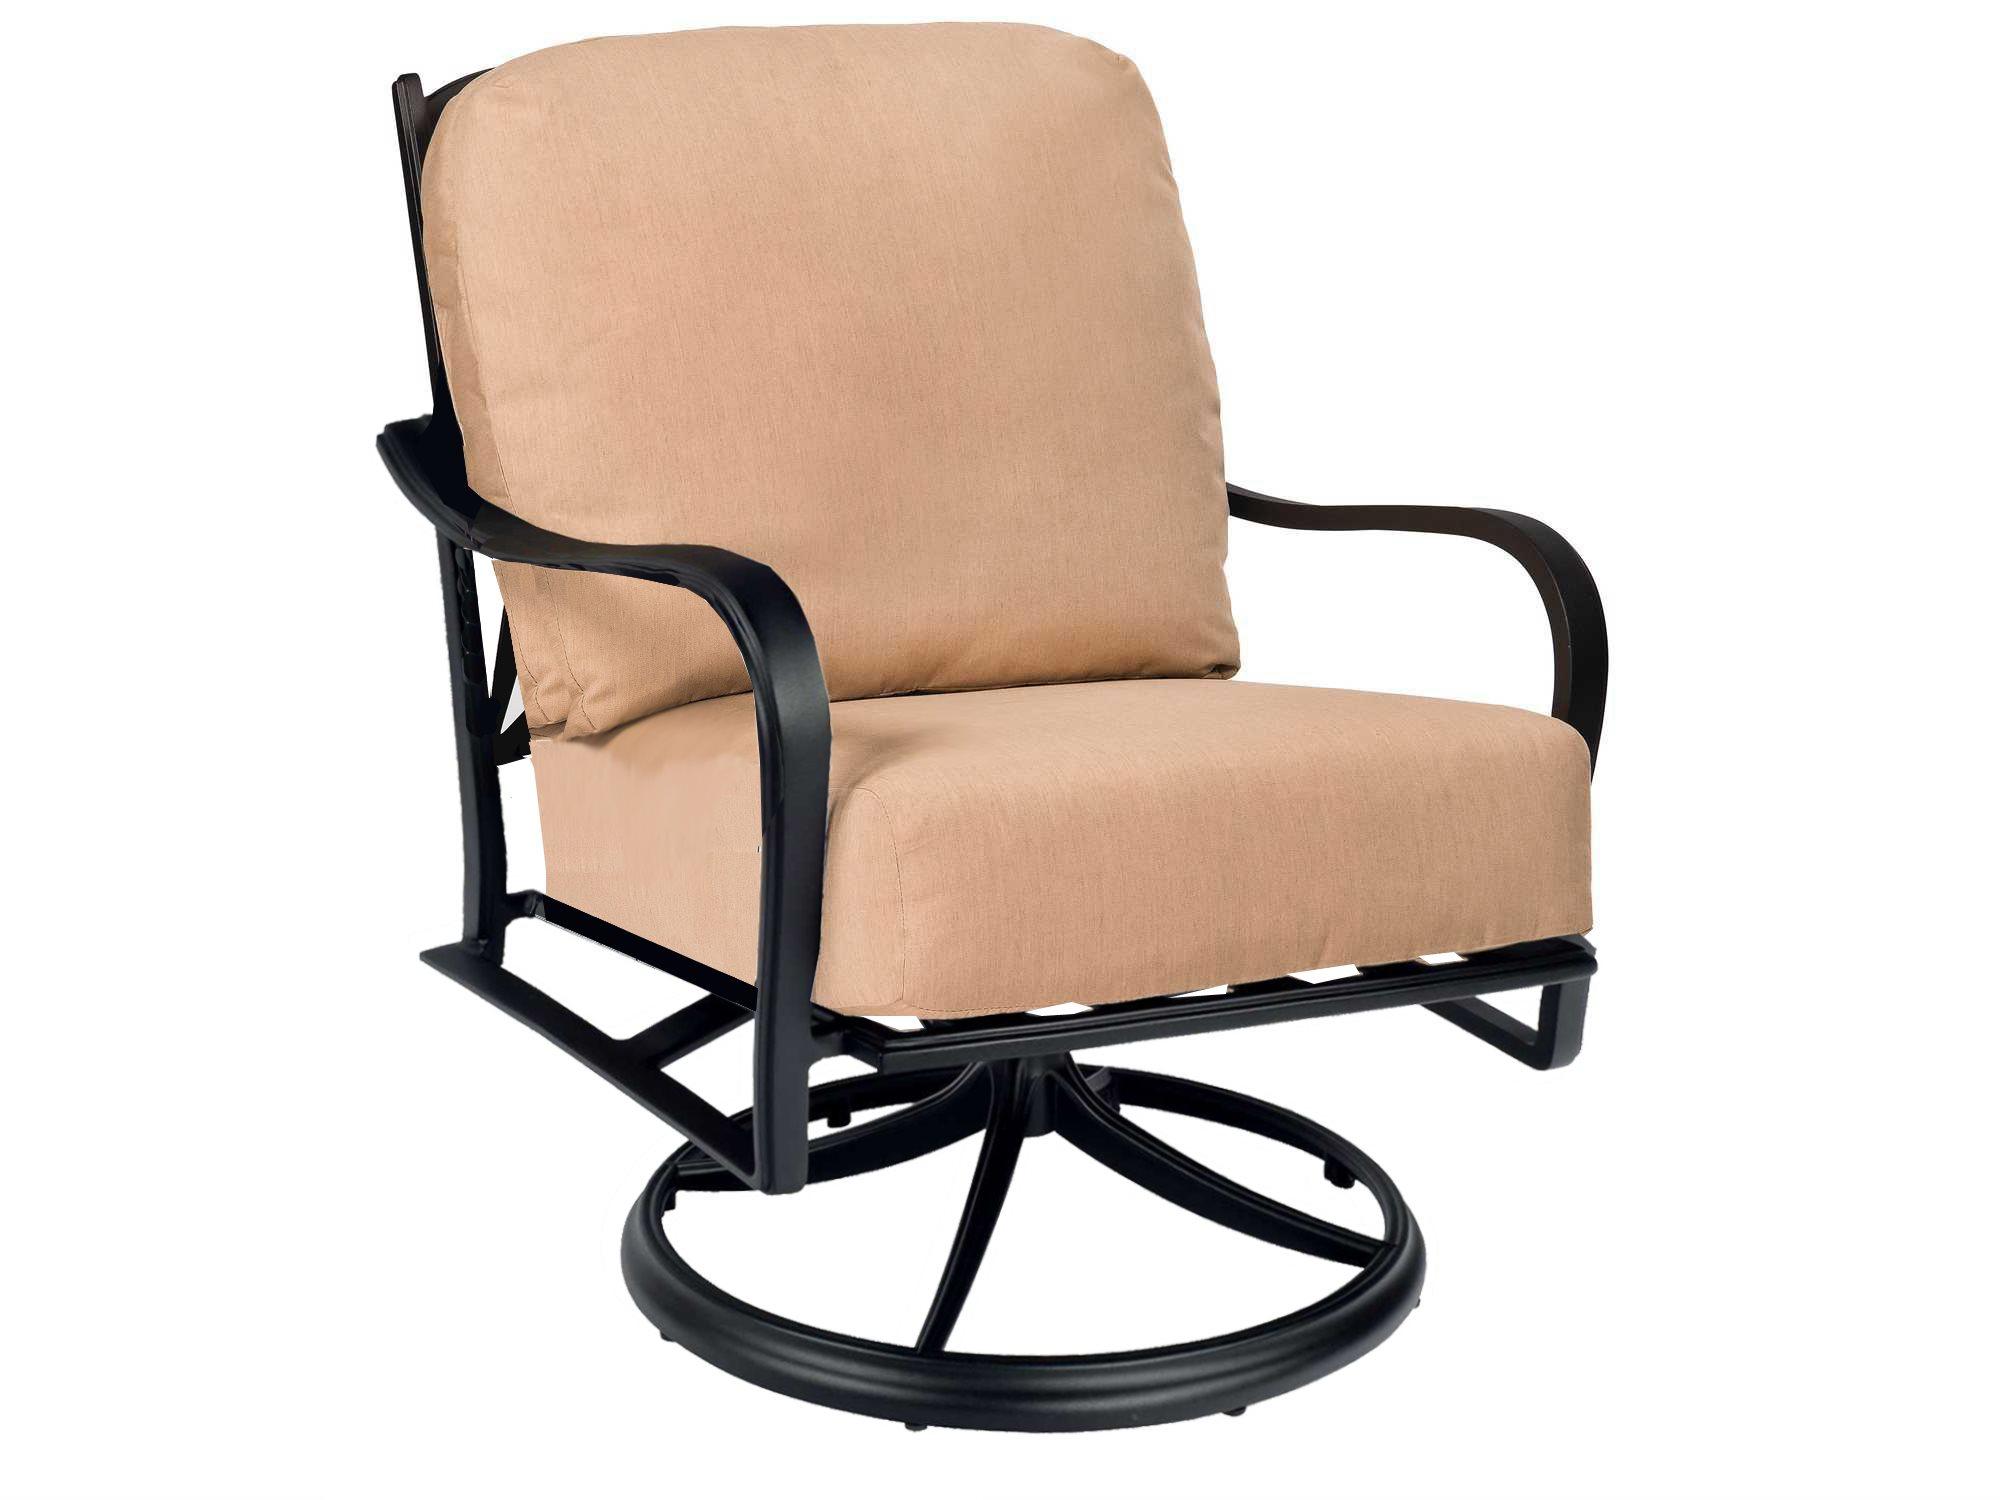 Woodard Apollo Swivel Rocker Lounge Chair Replacement